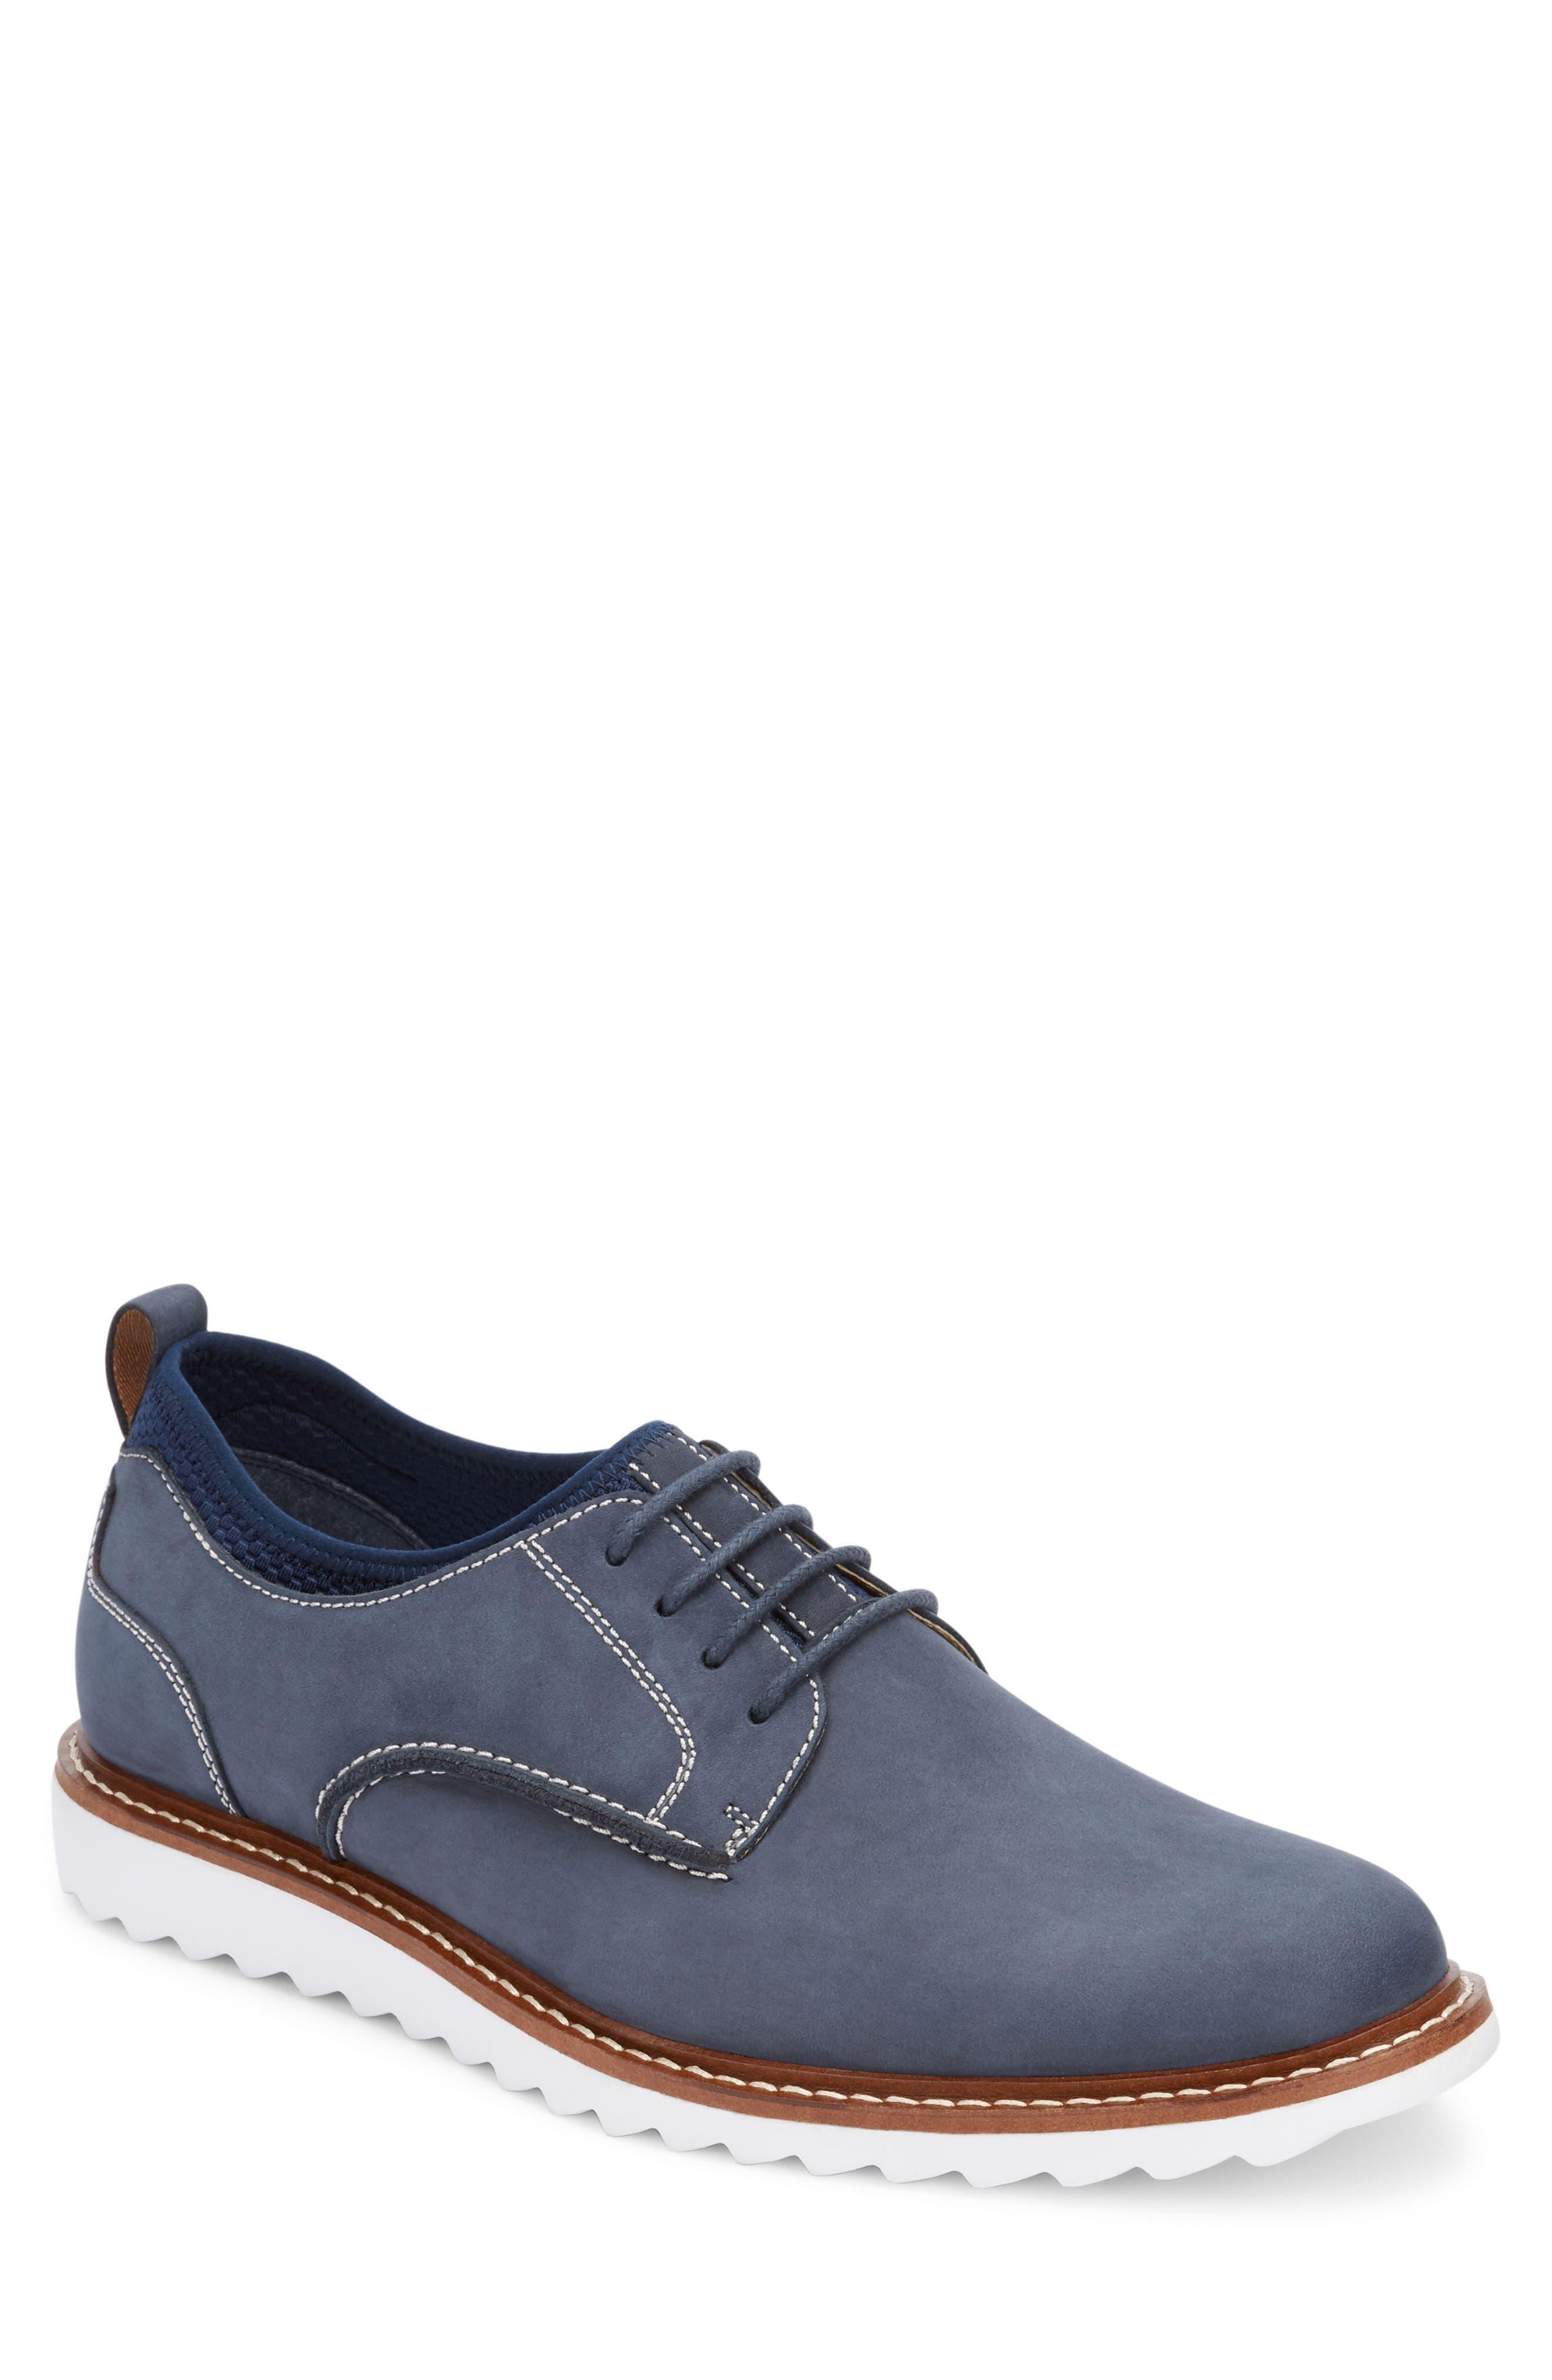 G.H. BASS & CO. Men'S Buck 2.0 Plain-Toe Oxfords Men'S Shoes in Navy Nubuck